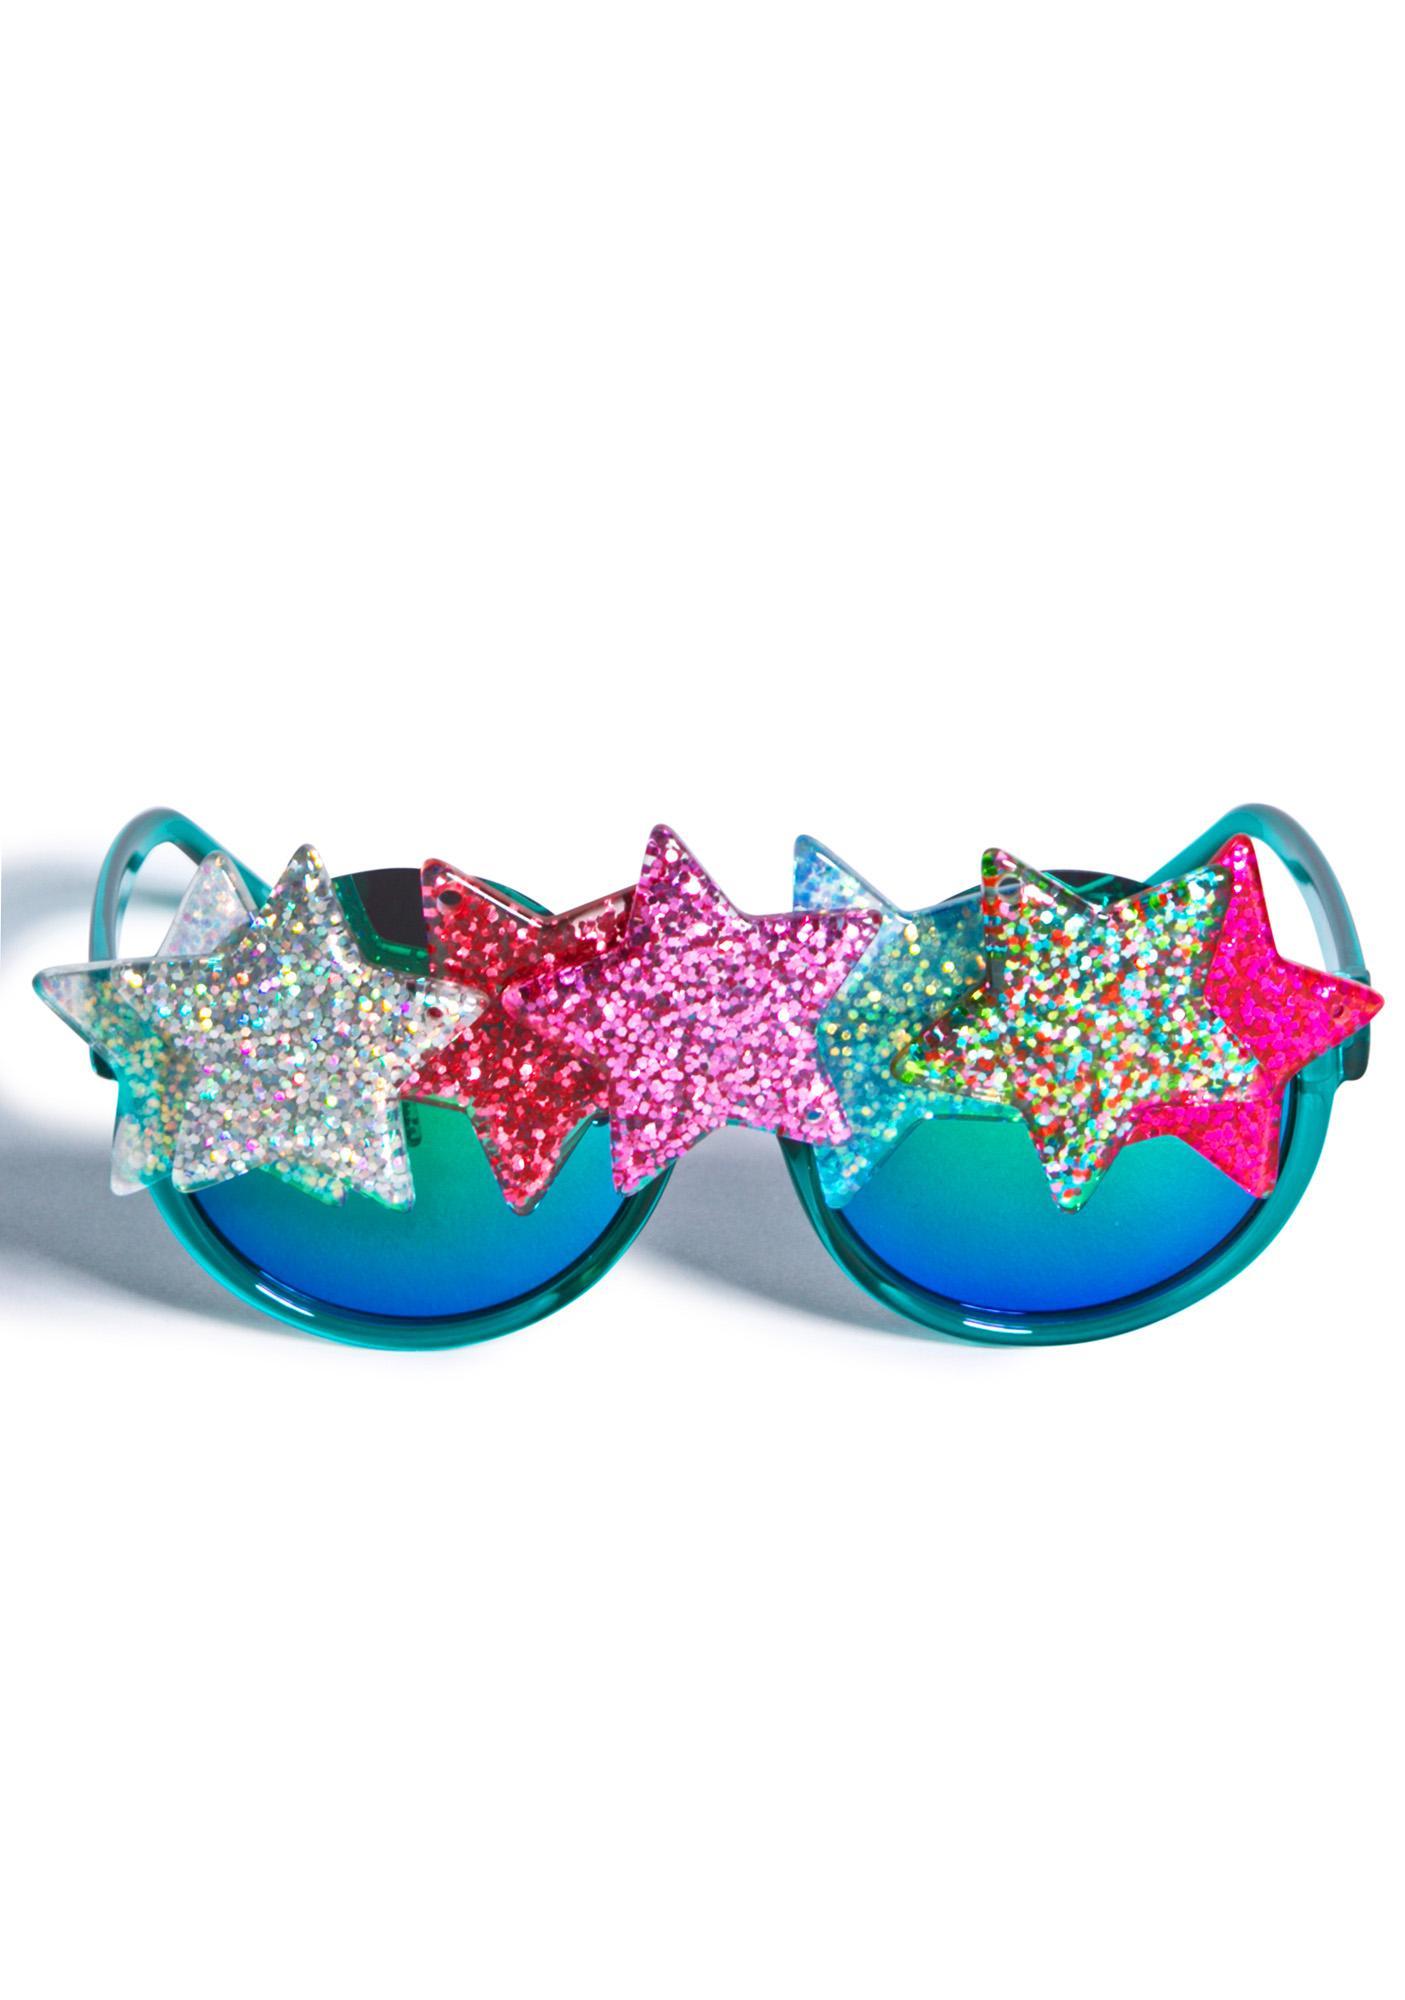 Gasoline Glamour Fantasia Shooting Star Acid Sunglasses